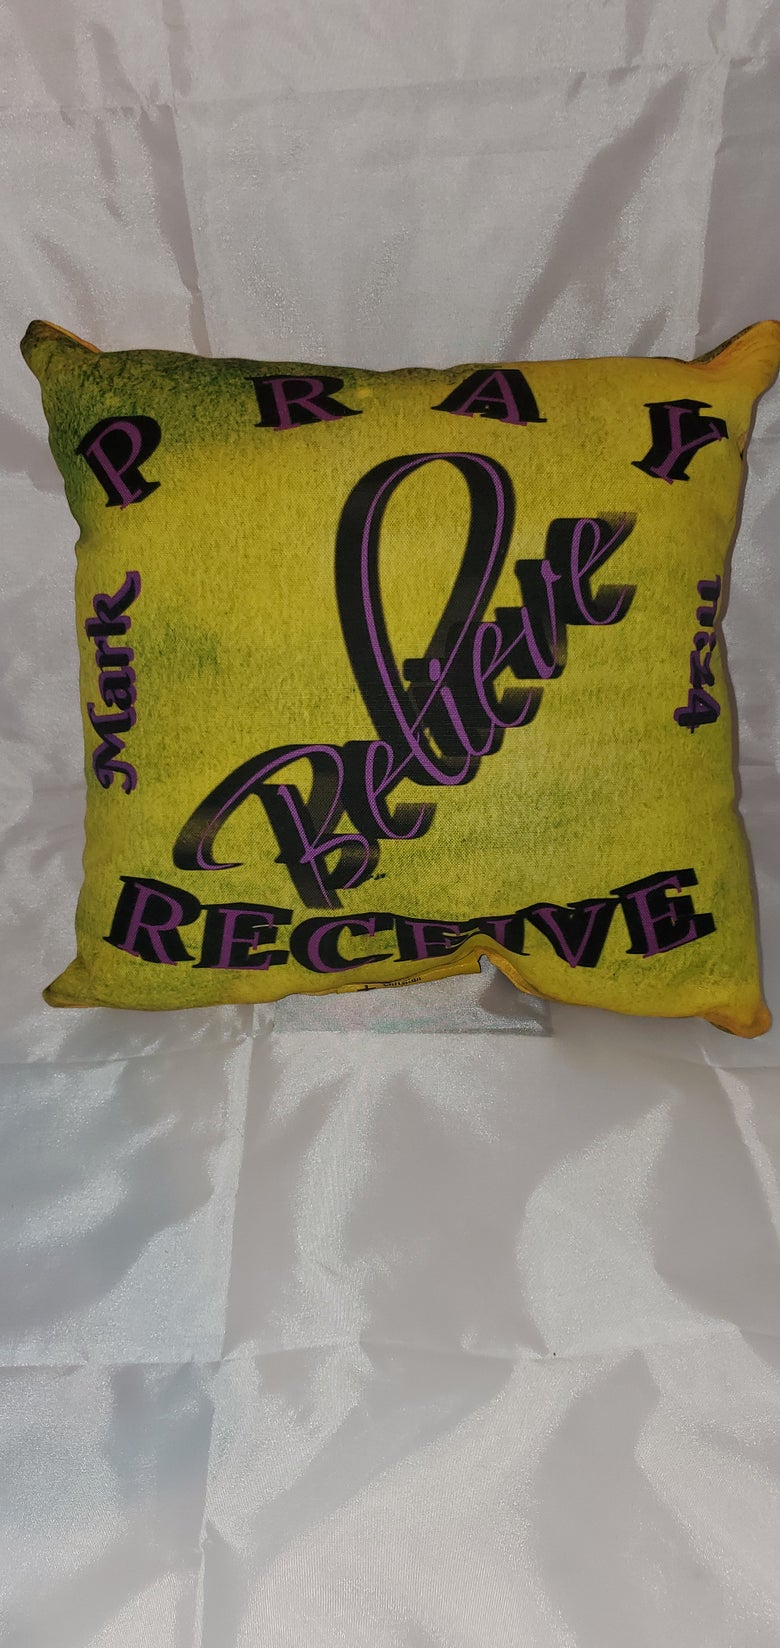 "Image of Pray/Beleve/Recieve 12"" x 12""  2-sided pilliow"